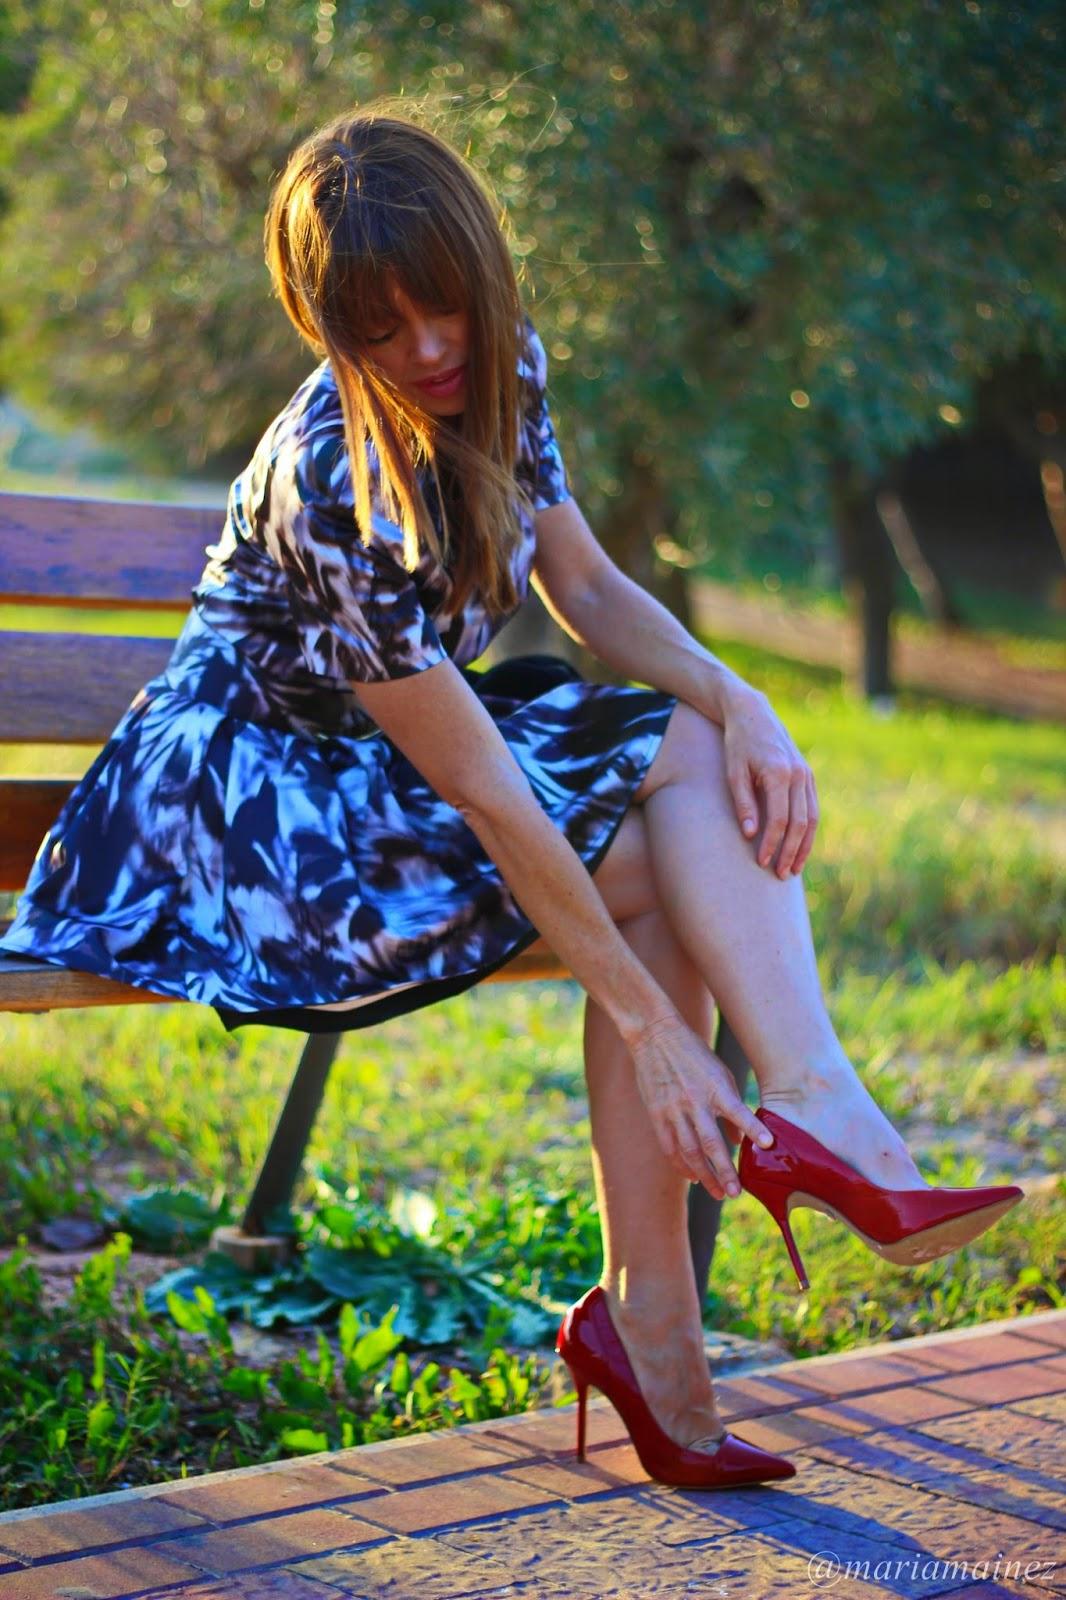 Elisabetta Franchi- Fall 2014 - Outfit Fall winter 2014 - Blogger Alicante- Stilettos rojos